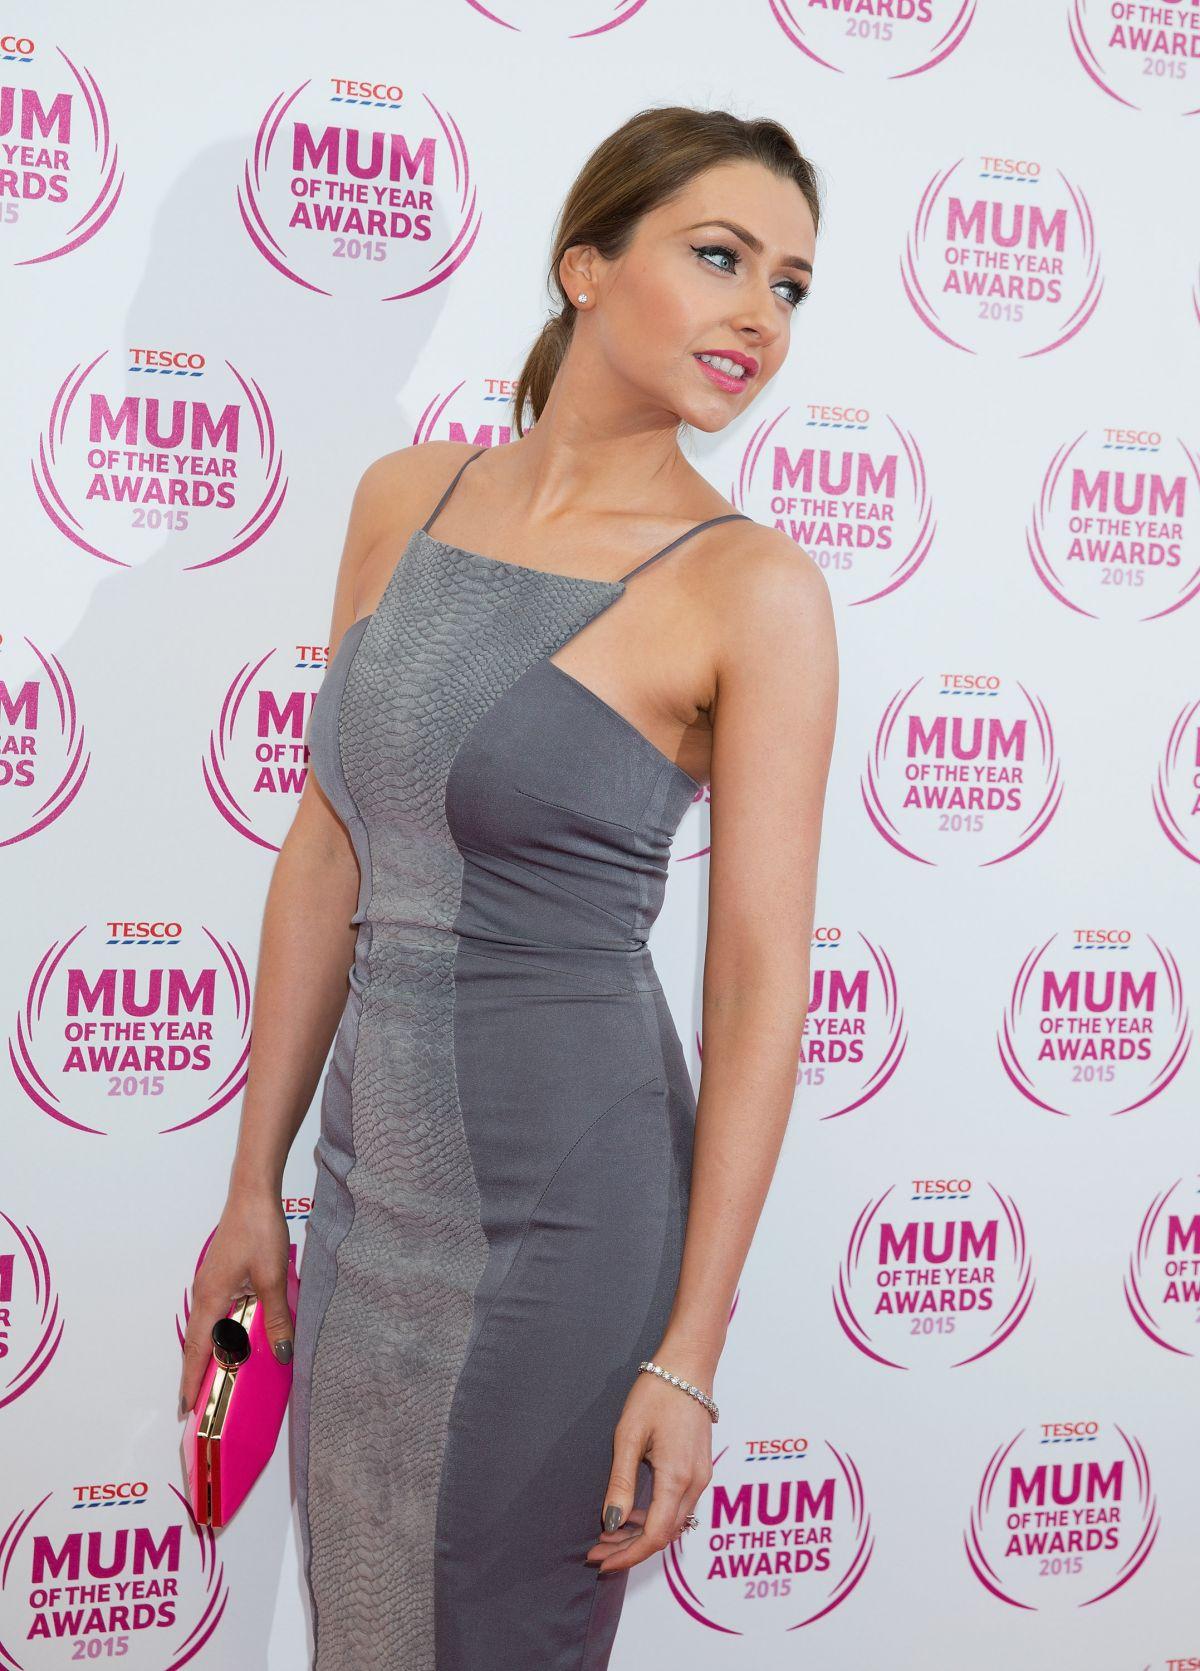 GEMMA MERNA at Mum of the Year 2015 Awards in London